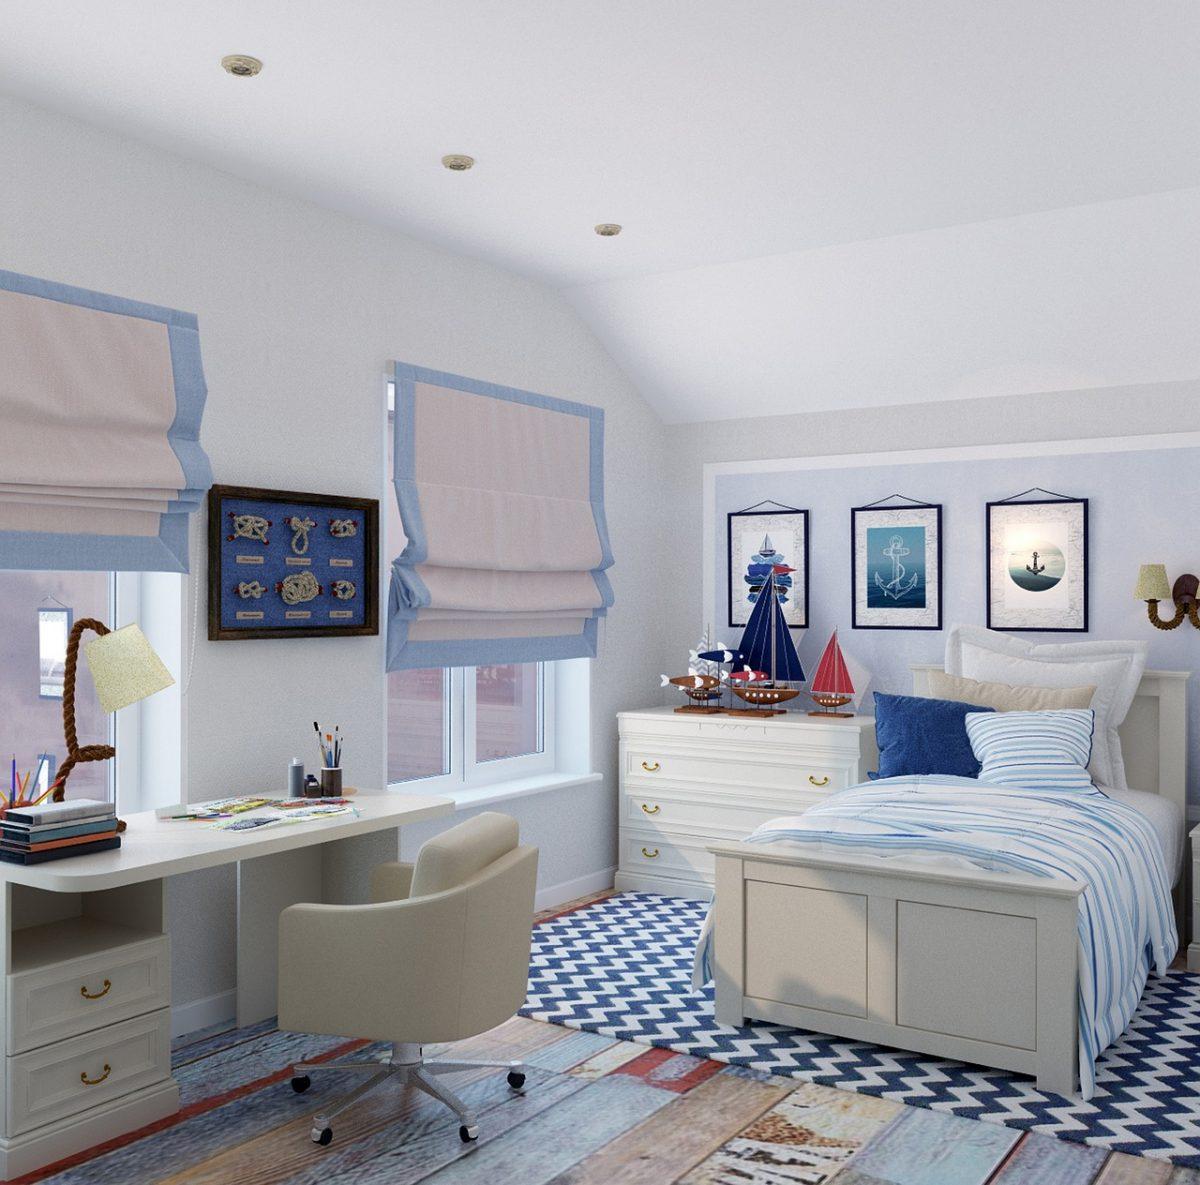 Kakva rasveta najbolje odgovara dečijoj sobi?